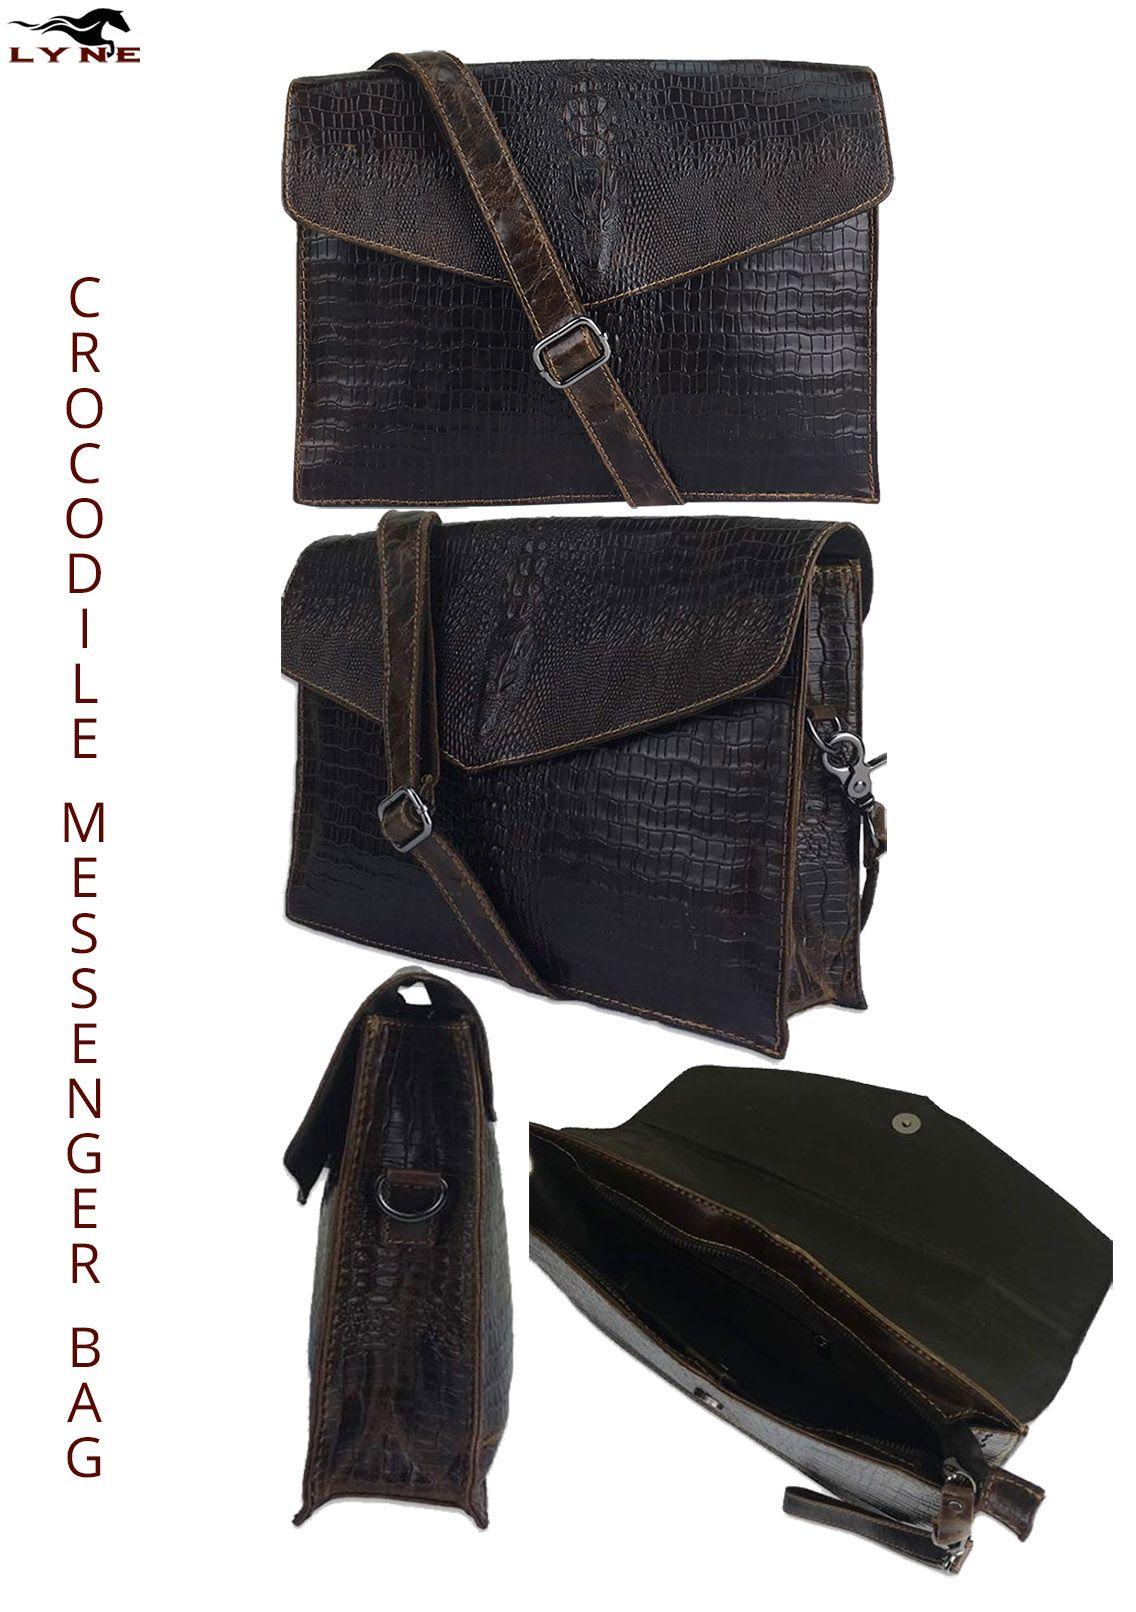 ba628d1a32 CROCODILE SHOULDER BAG SATCHEL. One of the classical and unique men s  shoulder leather bag from